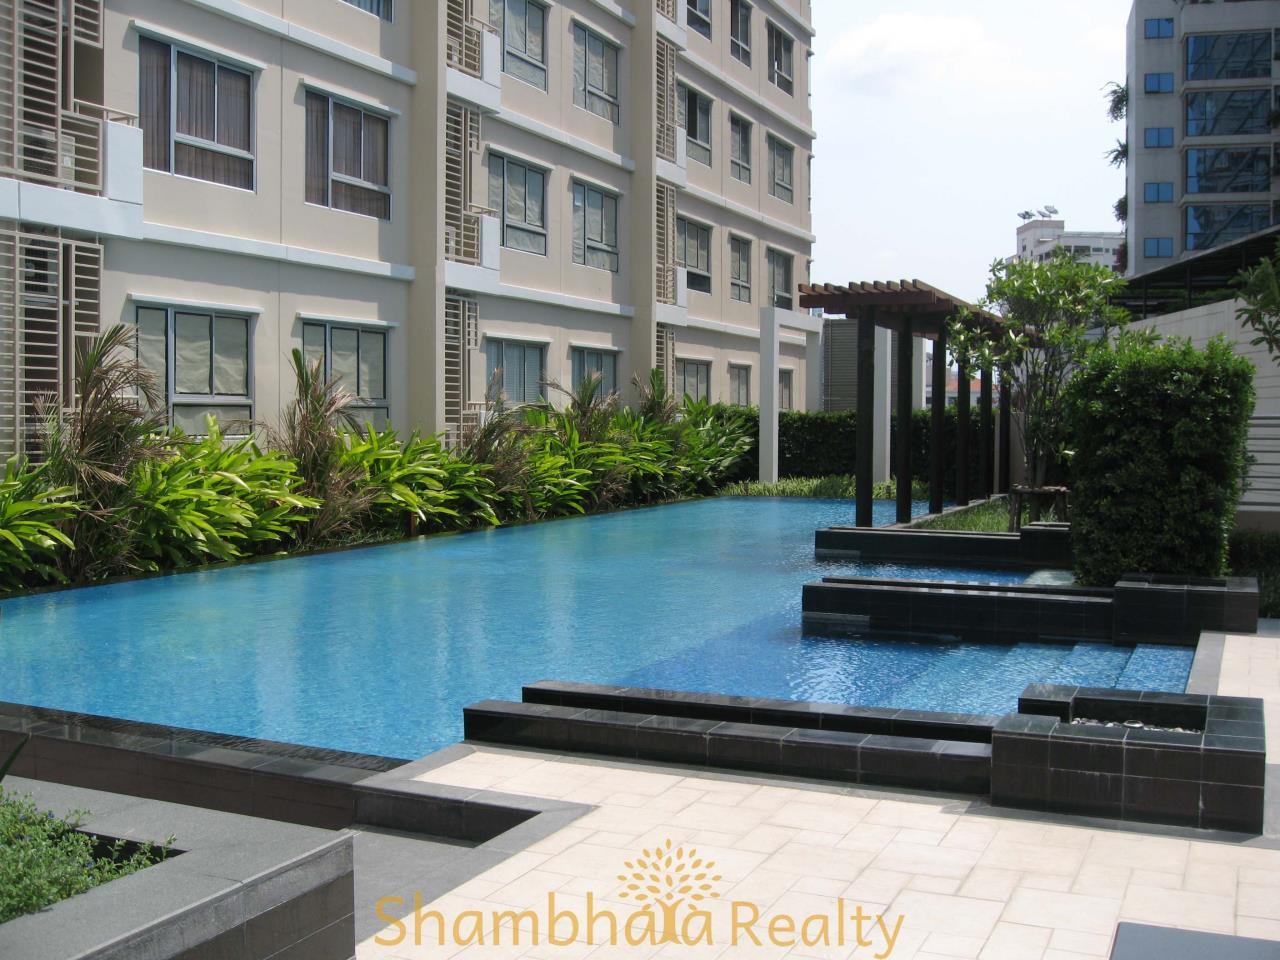 Shambhala Realty Agency's Condo One X Sukhumvit 26 Condominium for Rent in Sukhumvit 26 4